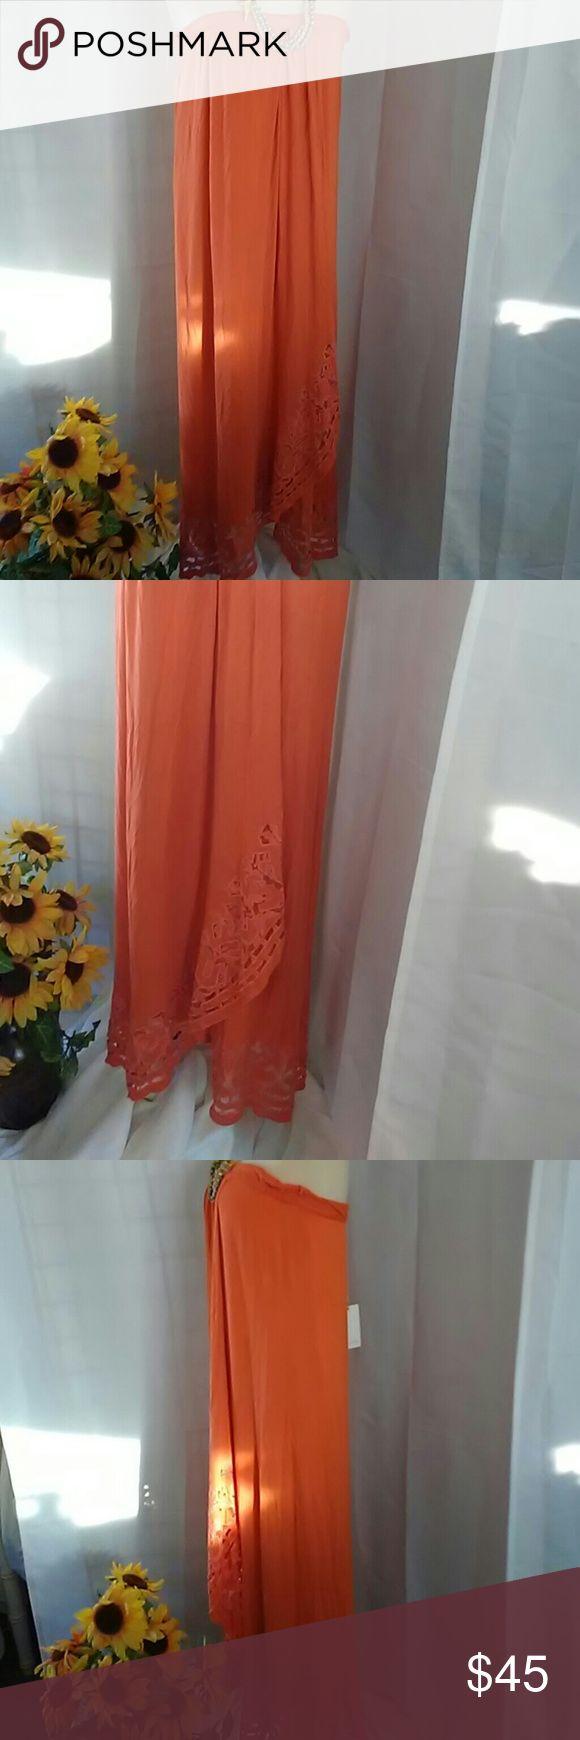 AMUTA NAITHANI orange Sarong like Dress Maxi length warm pumpkin orange color.  Cut out border around the hem. Size M. Straight cut with cutaway skirt in front. Strapless. Truely memorable piece. Amita Naithani Dresses Strapless